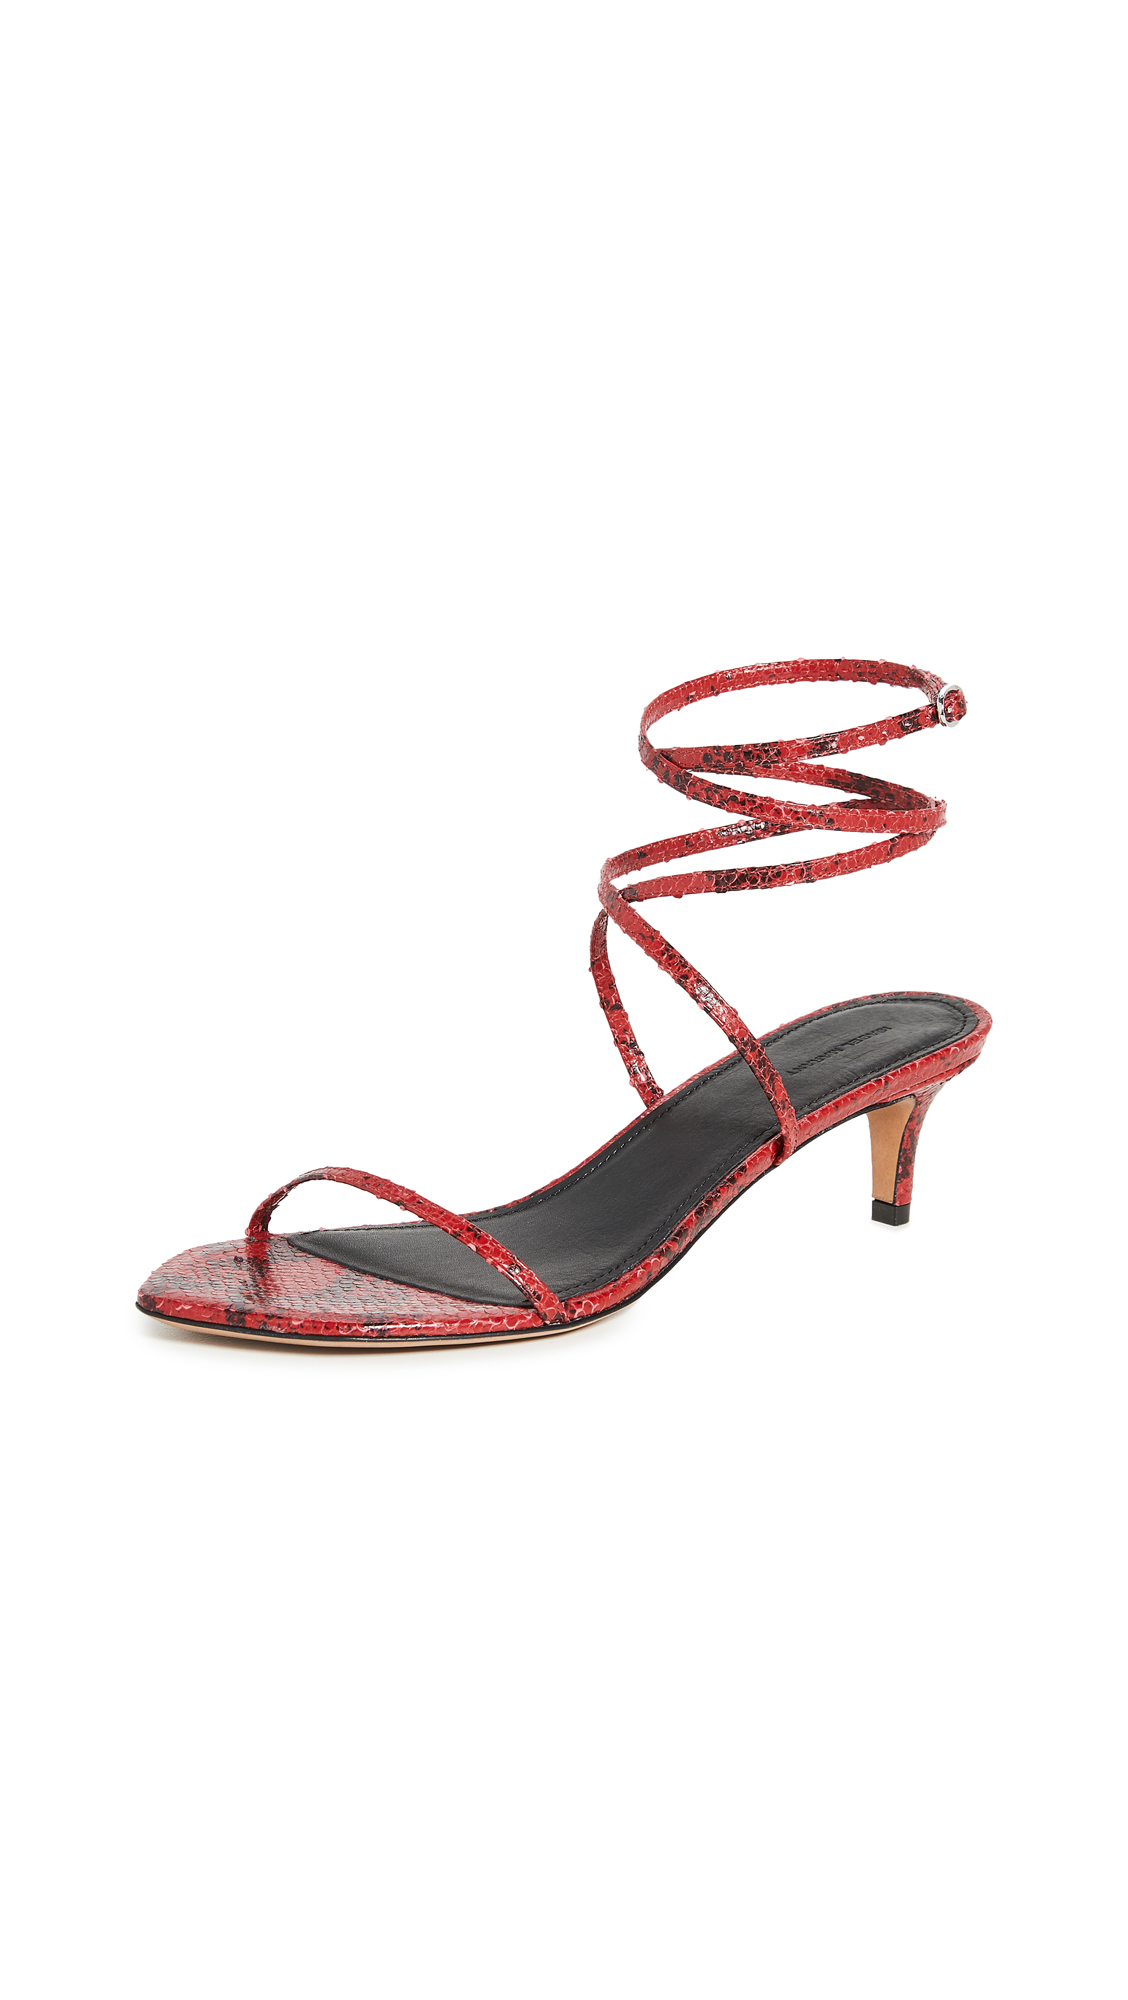 Buy Isabel Marant Aridee Sandals online, shop Isabel Marant